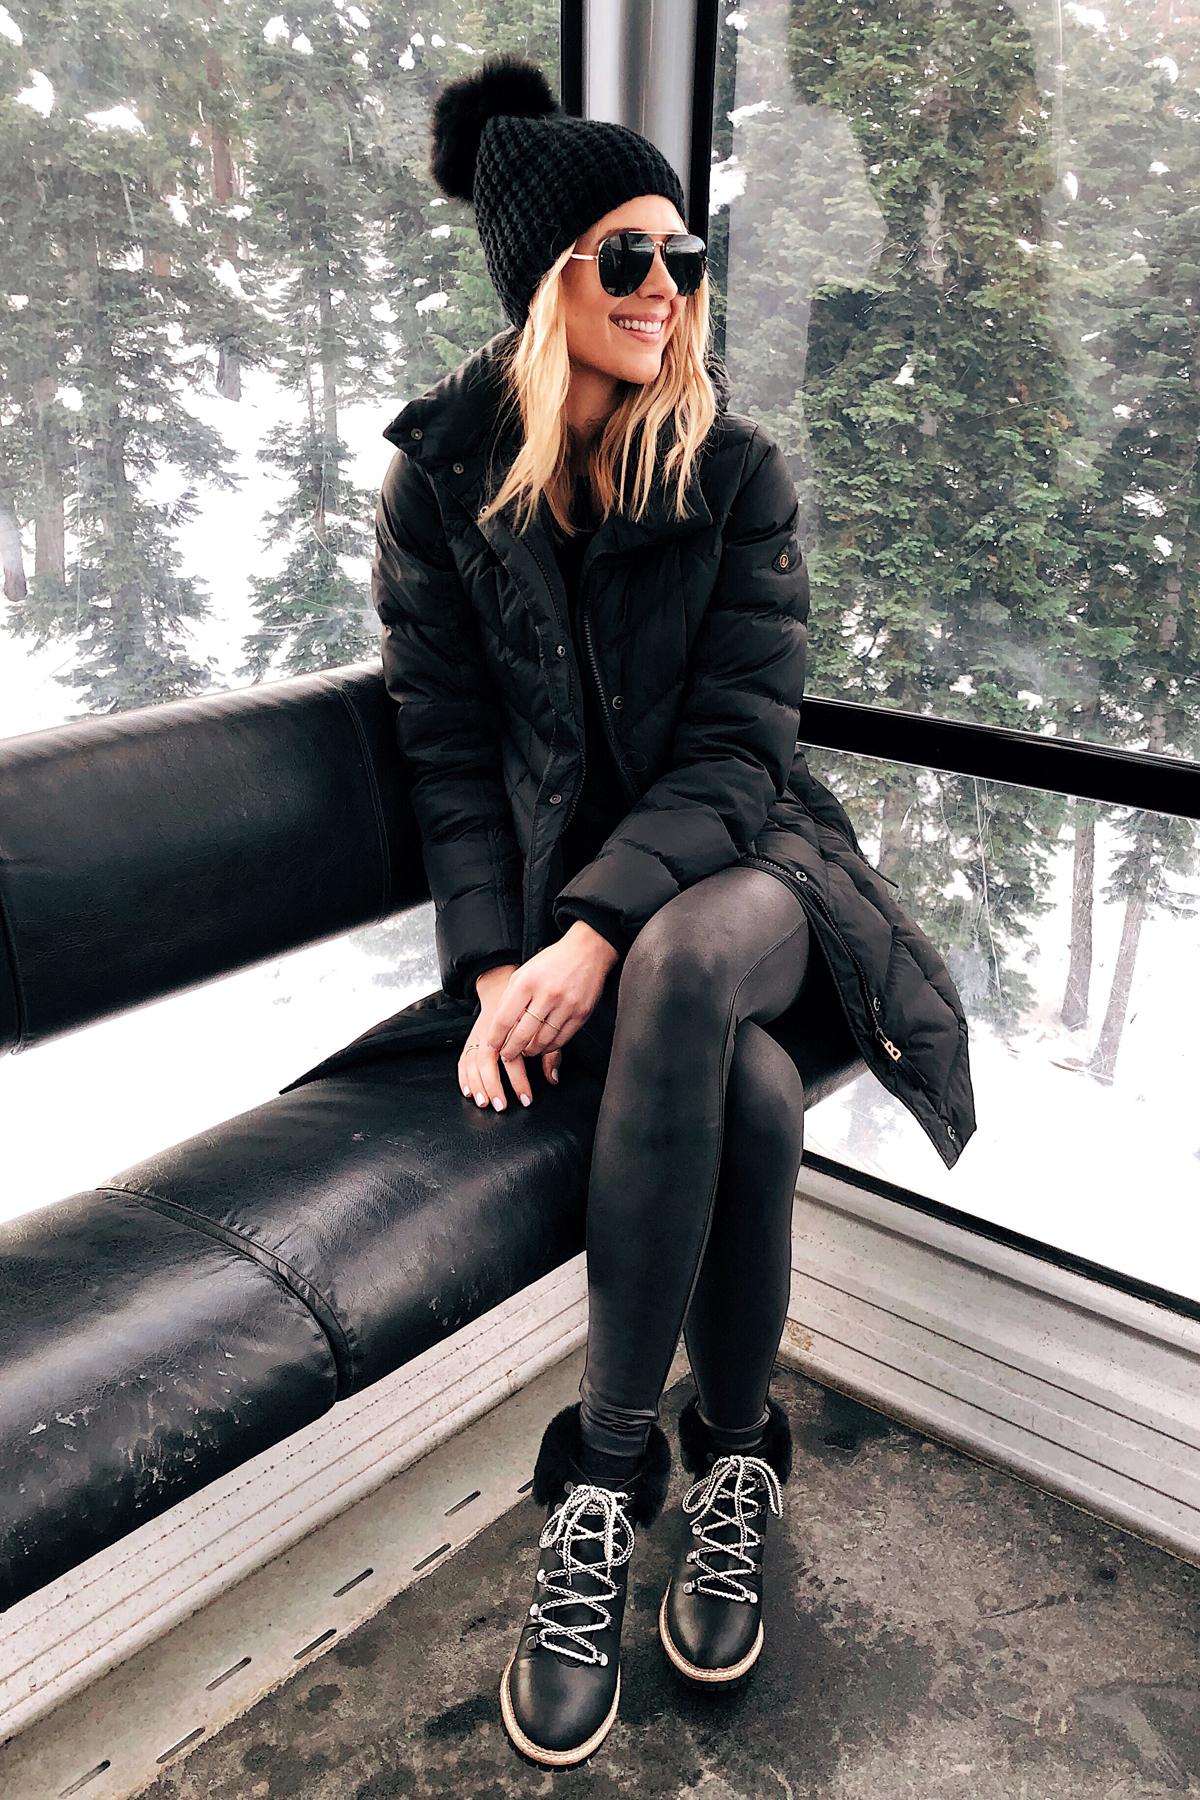 Fashion-Jackson-Wearing-Bogner-Black-Jacet-Spanx-Faux-Leather-Leggings-Black-Winter-Boots-Black-Beanie-Winter-Outfit